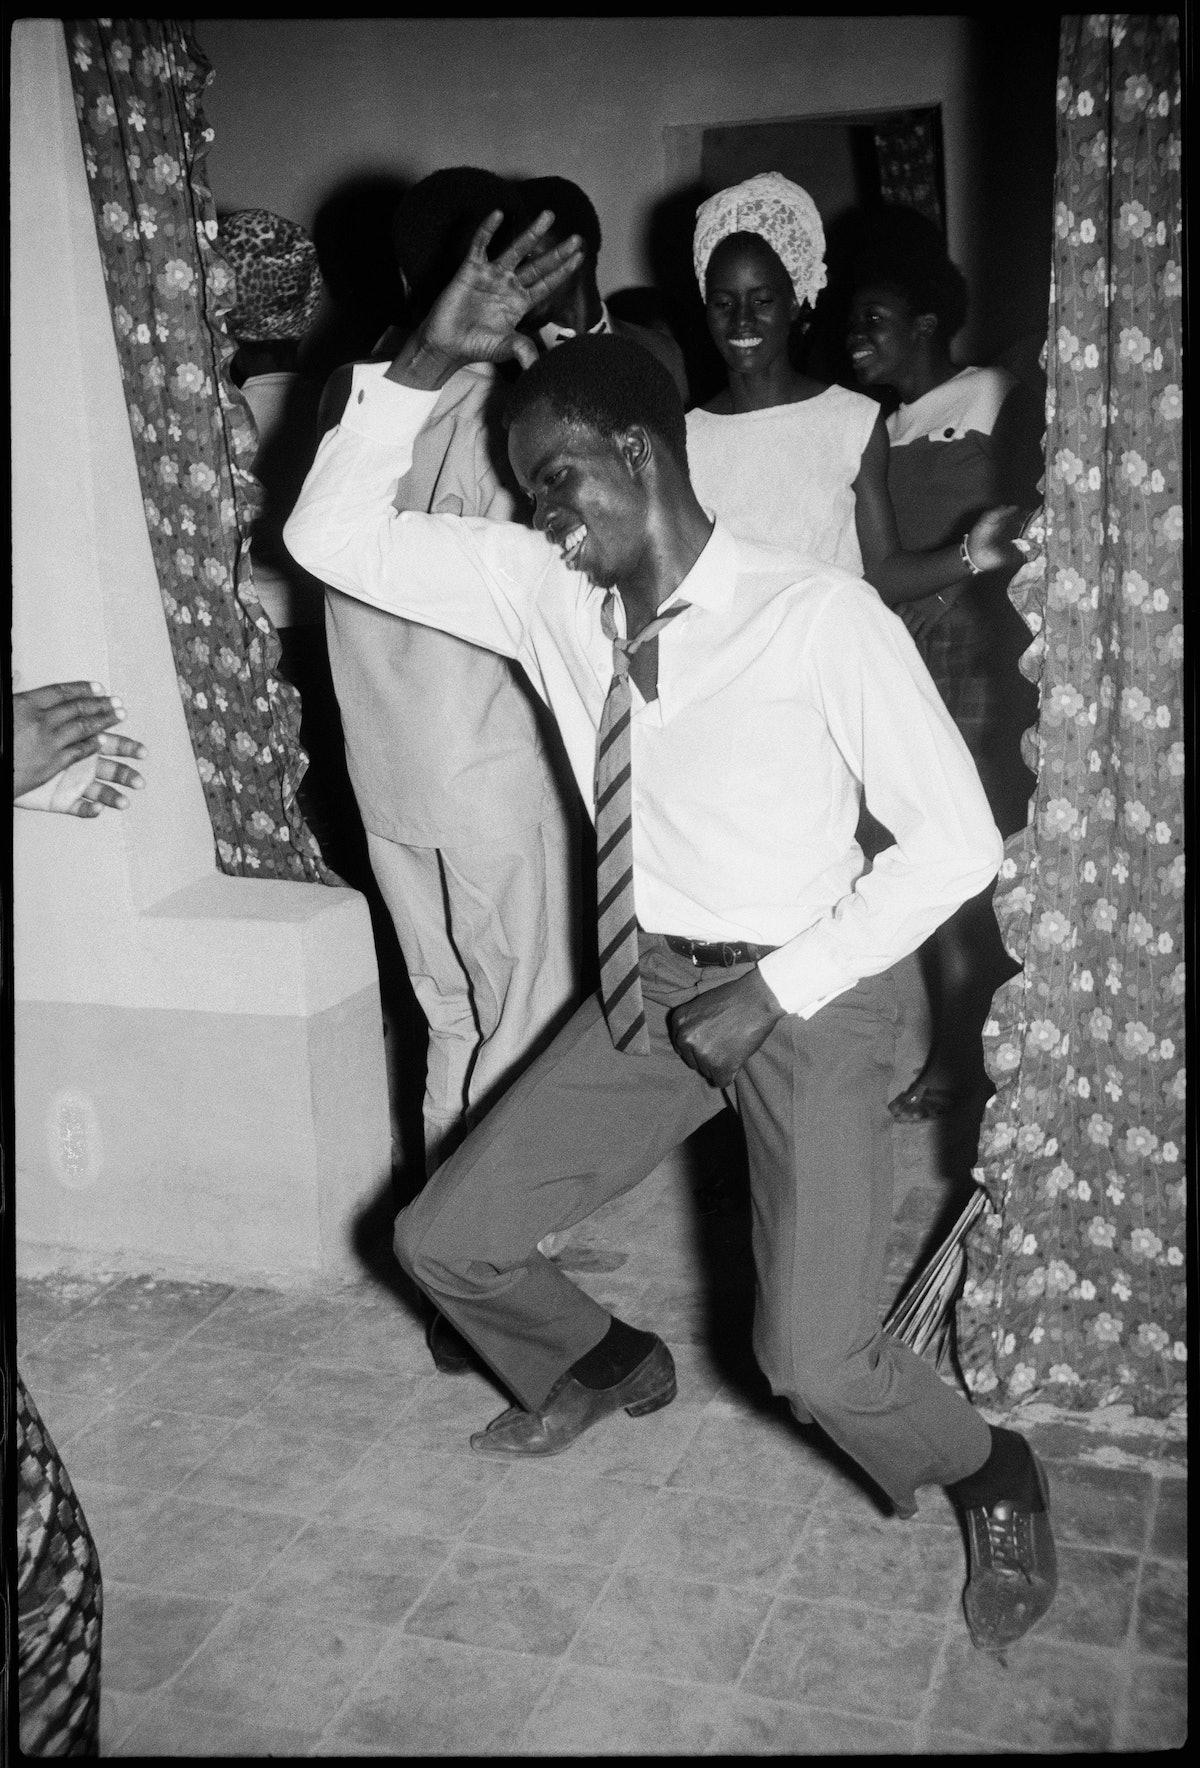 Malick Sidibé, Danseur Meringué, 1964 (c) Malick Sidibé. Courtesy Galerie MAGNIN-A, Paris.jpg